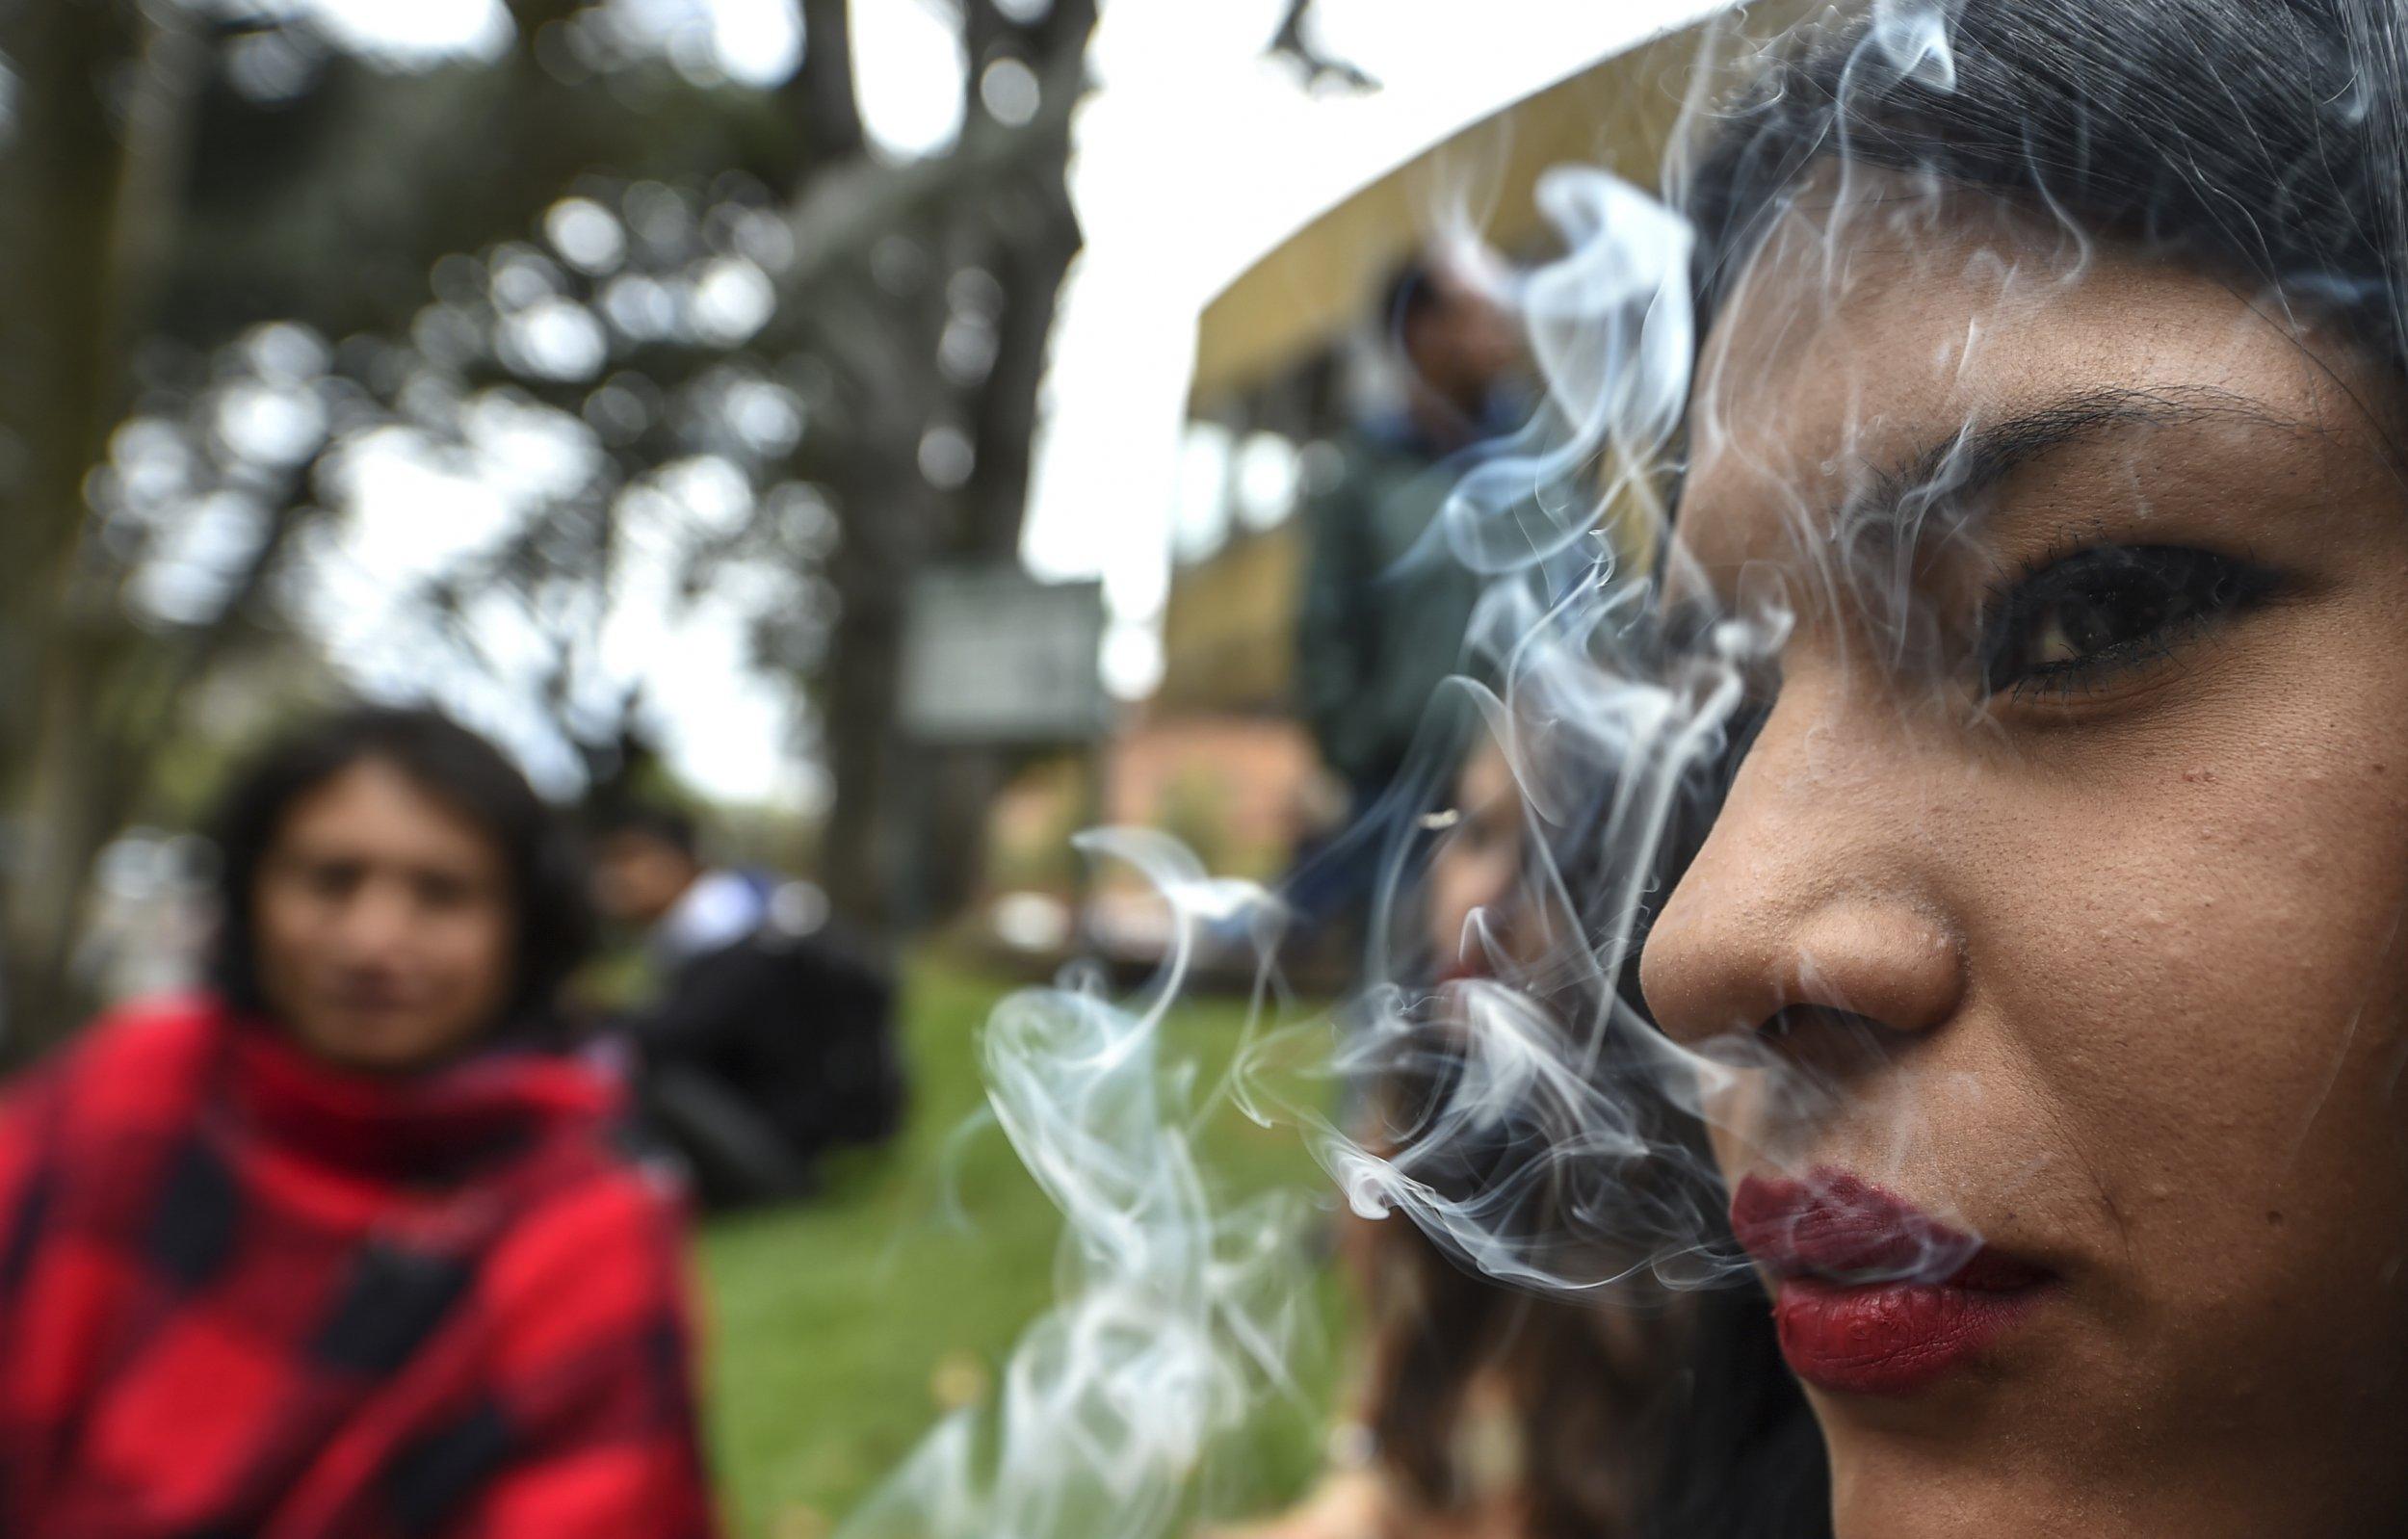 09_29_Mcdonalds_Tacobell_weedlegalization_marijuana